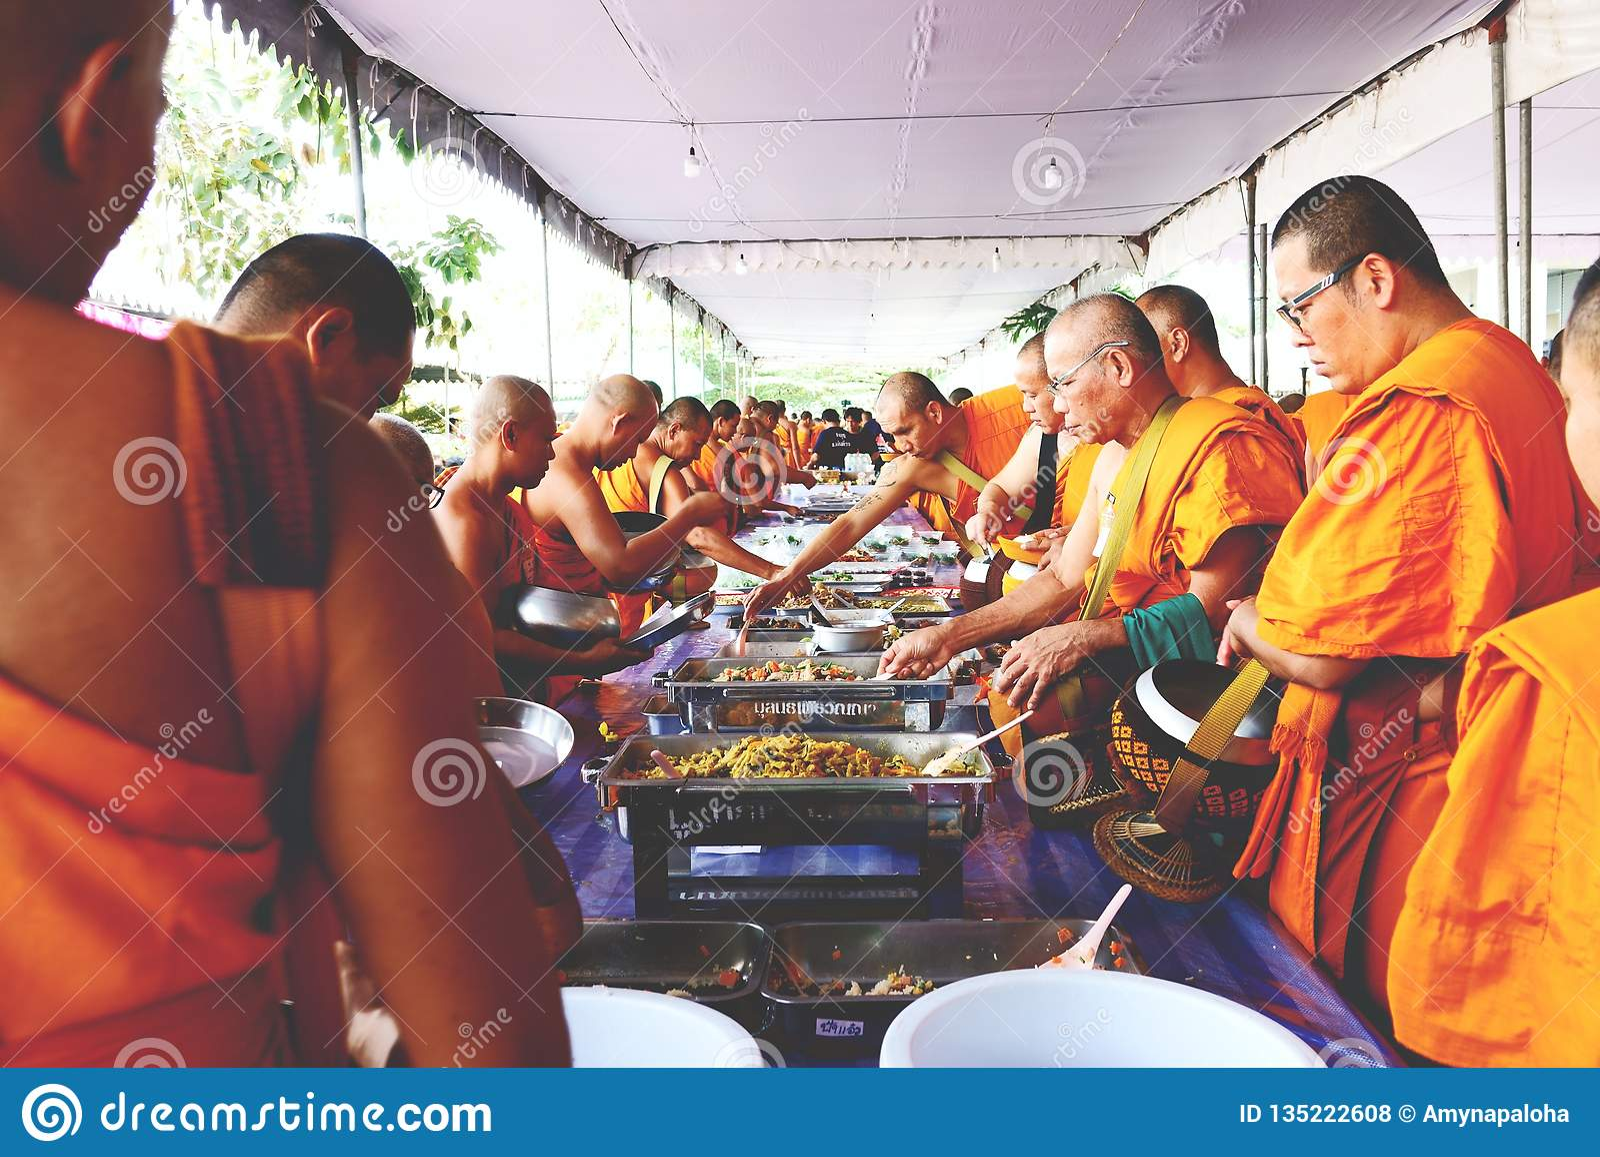 07 december 2018, Thep Khunakon Road, Na Mueang, Chachoengsao, Thailand, Monks recept alms at University for Monks